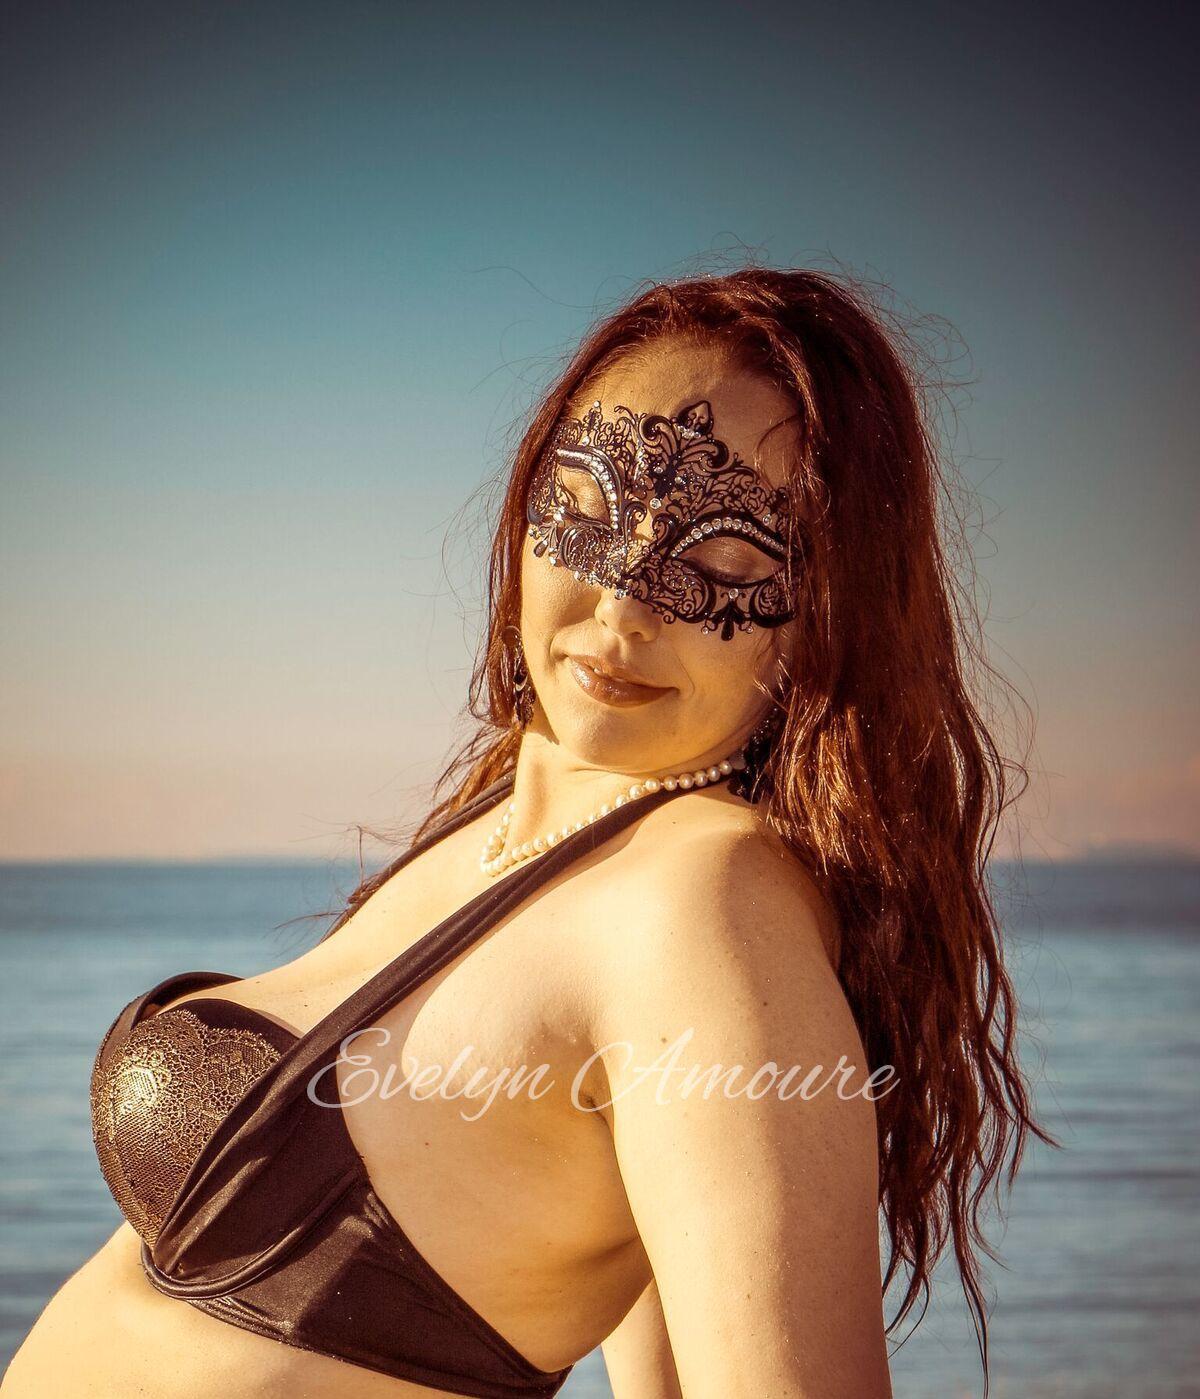 Evelyn Amoure 22.jpg